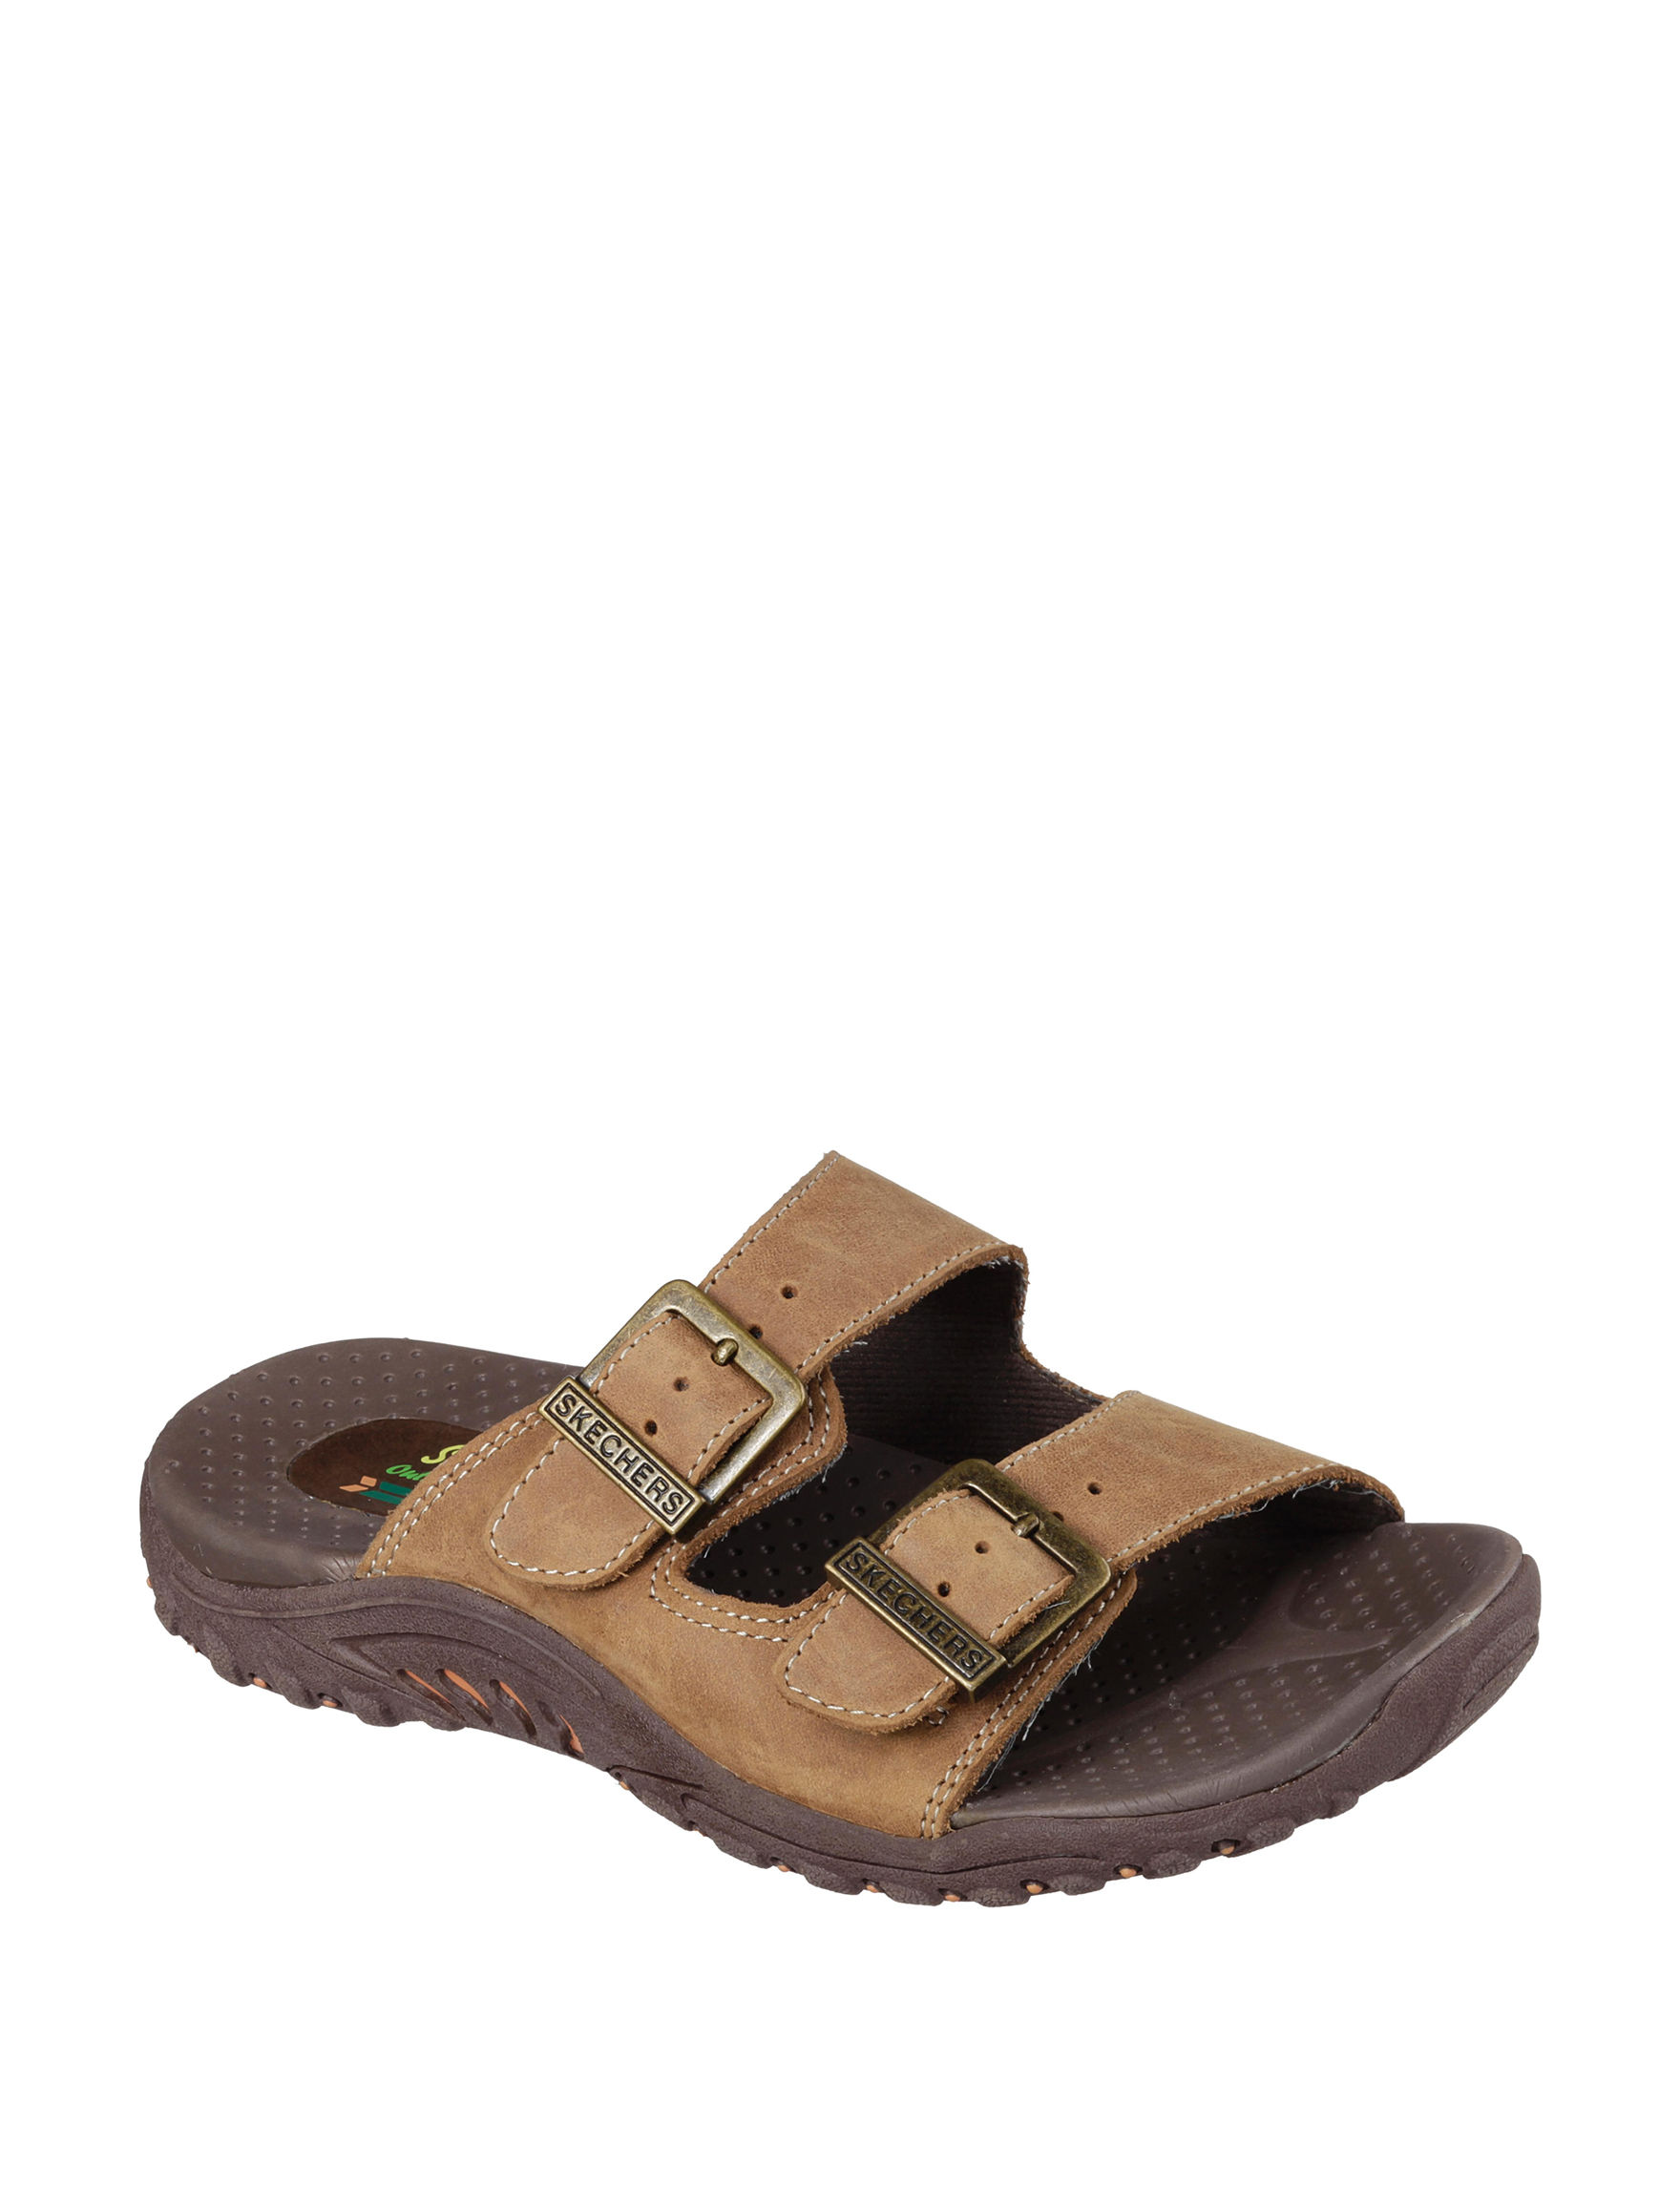 Skechers White Flat Sandals Sport Sandals